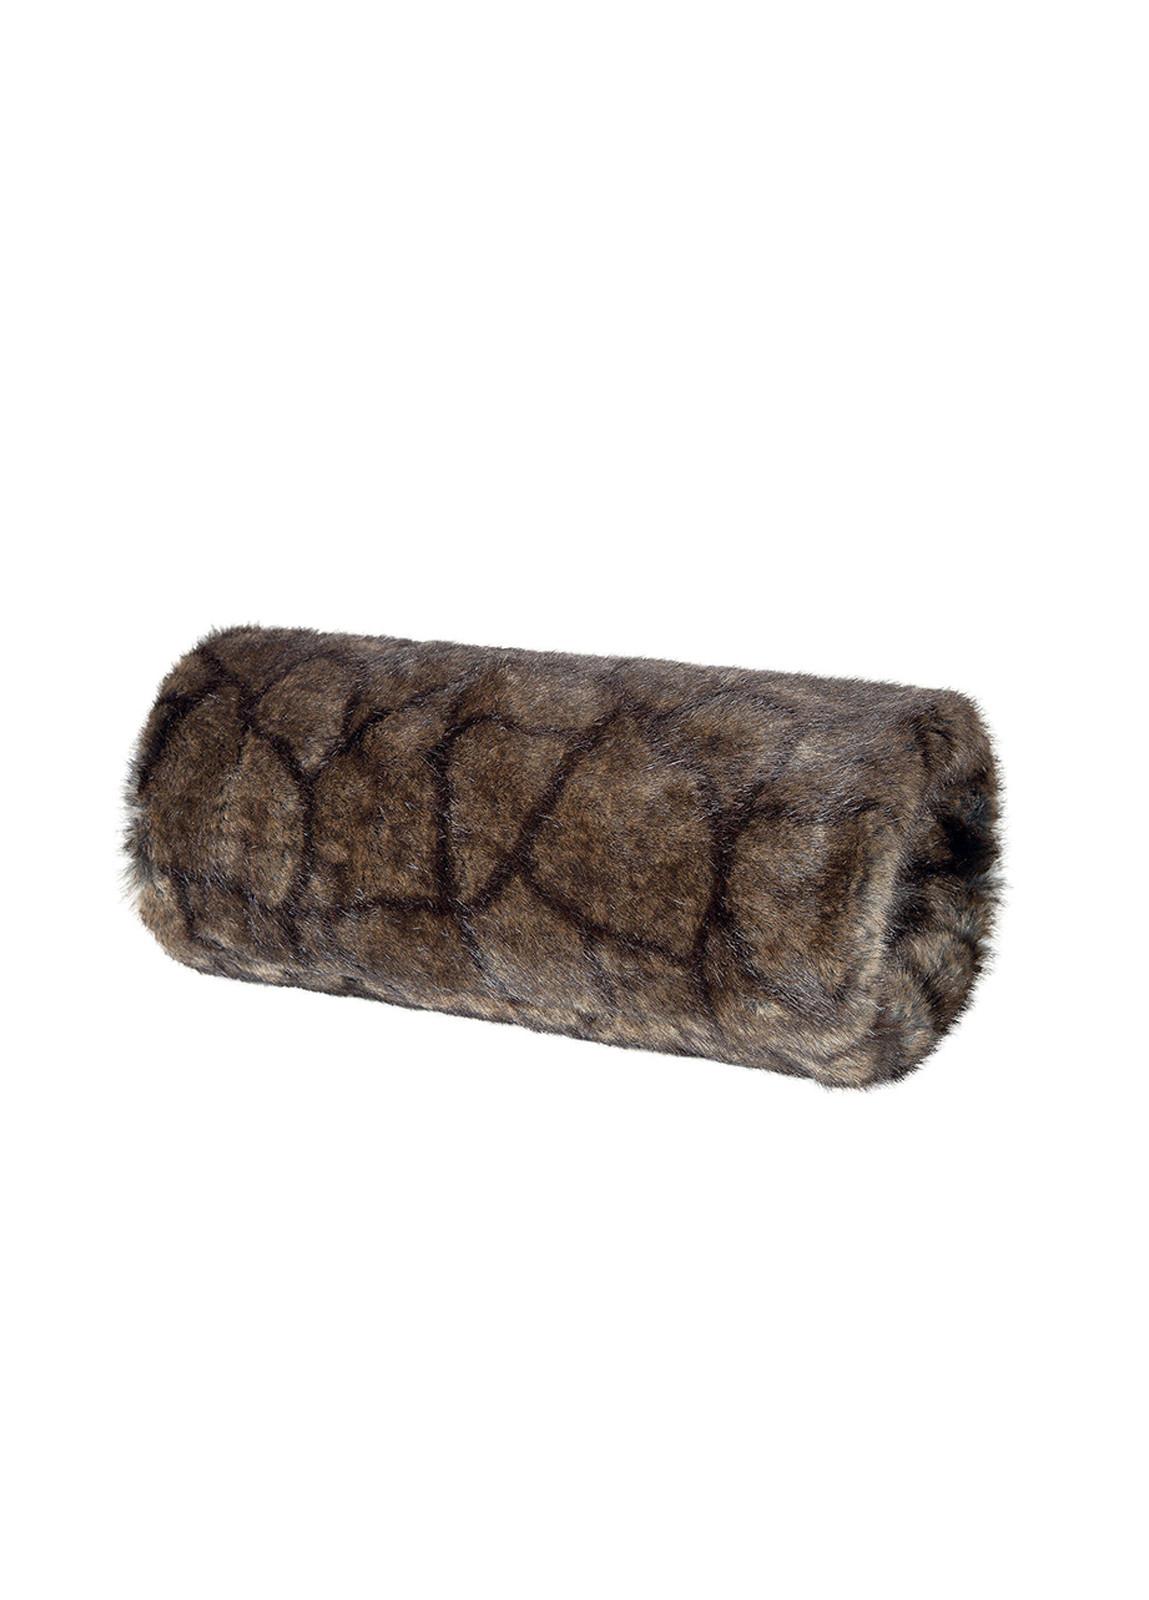 Dubarry_Swords Faux Fur Muff - Elk_Image_2